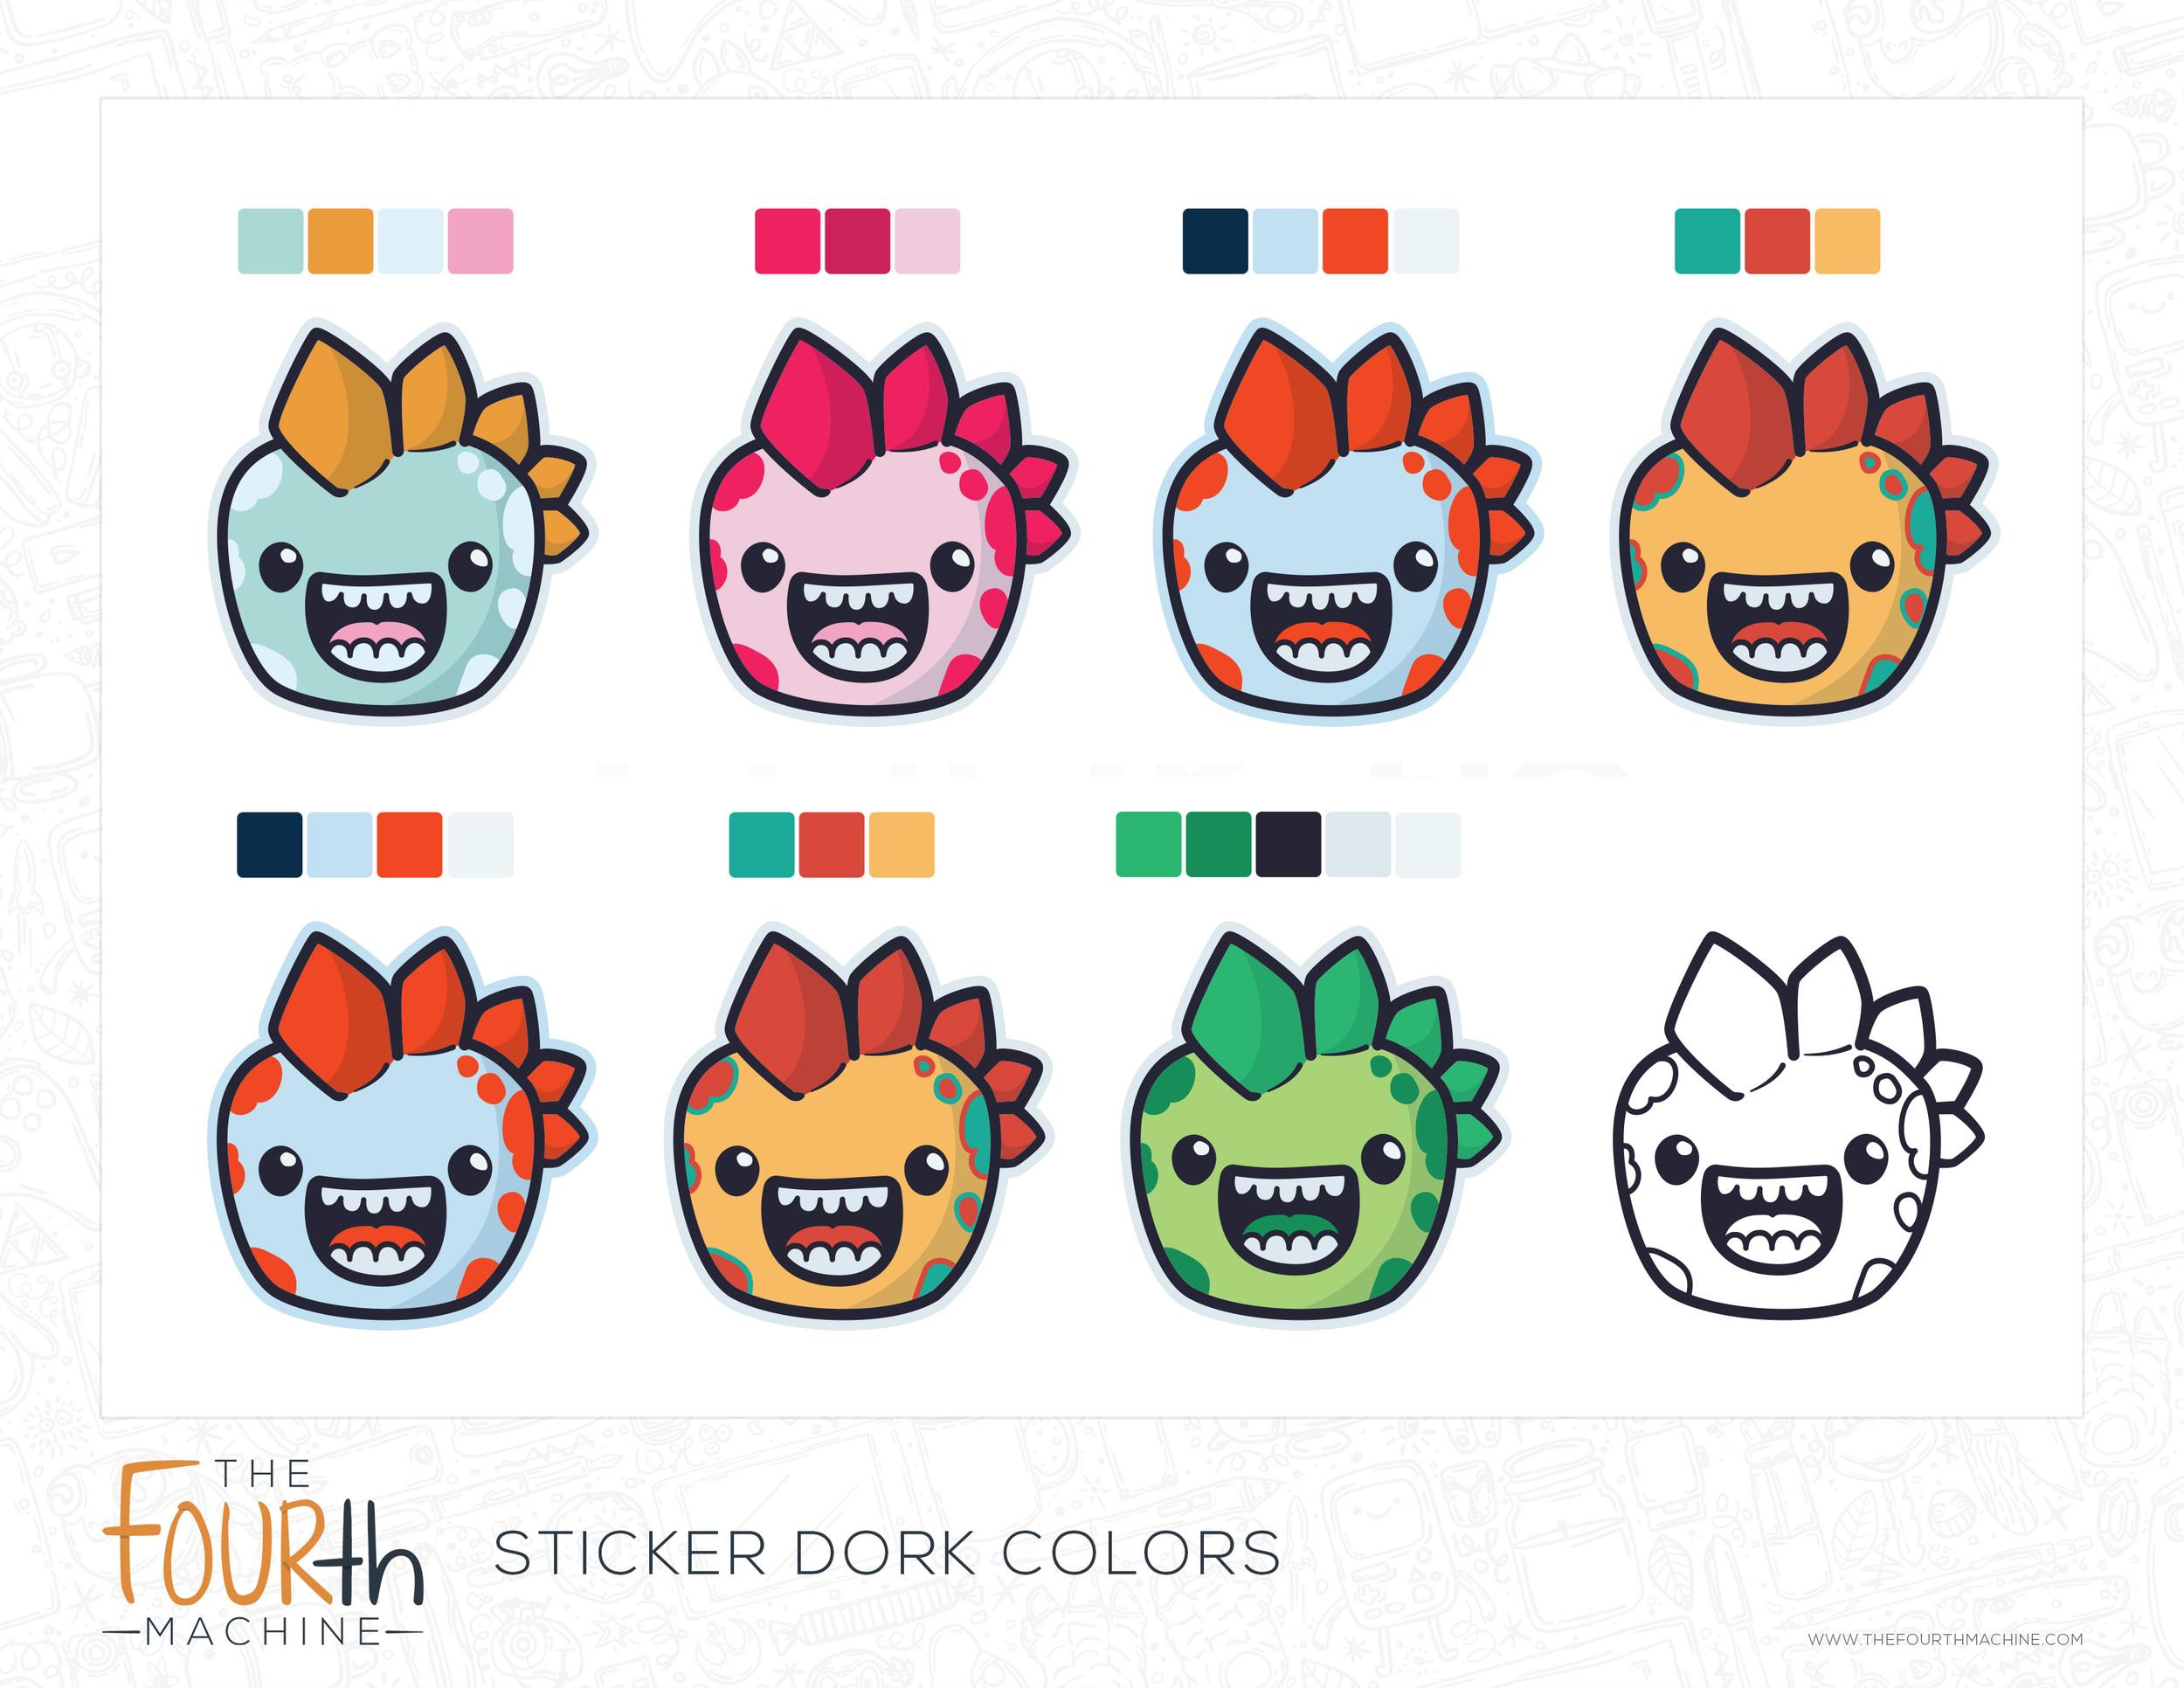 Sticker Dork Colors.jpg